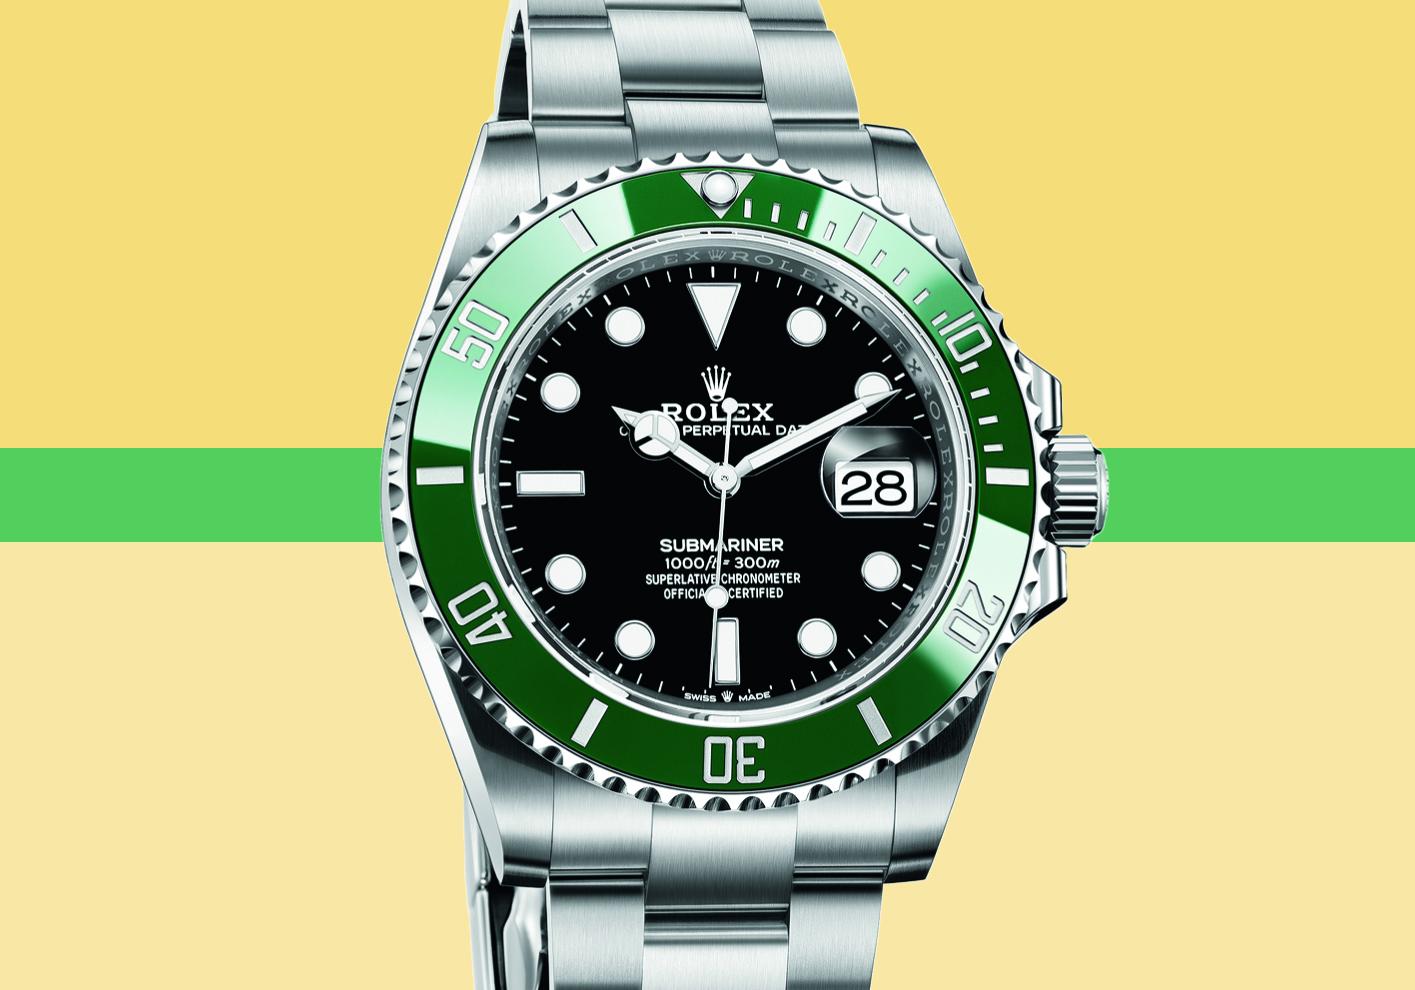 Submariner with green bezel, £7,650 (Submariner range, from £6,450; Submariner Date range, from £7,300)